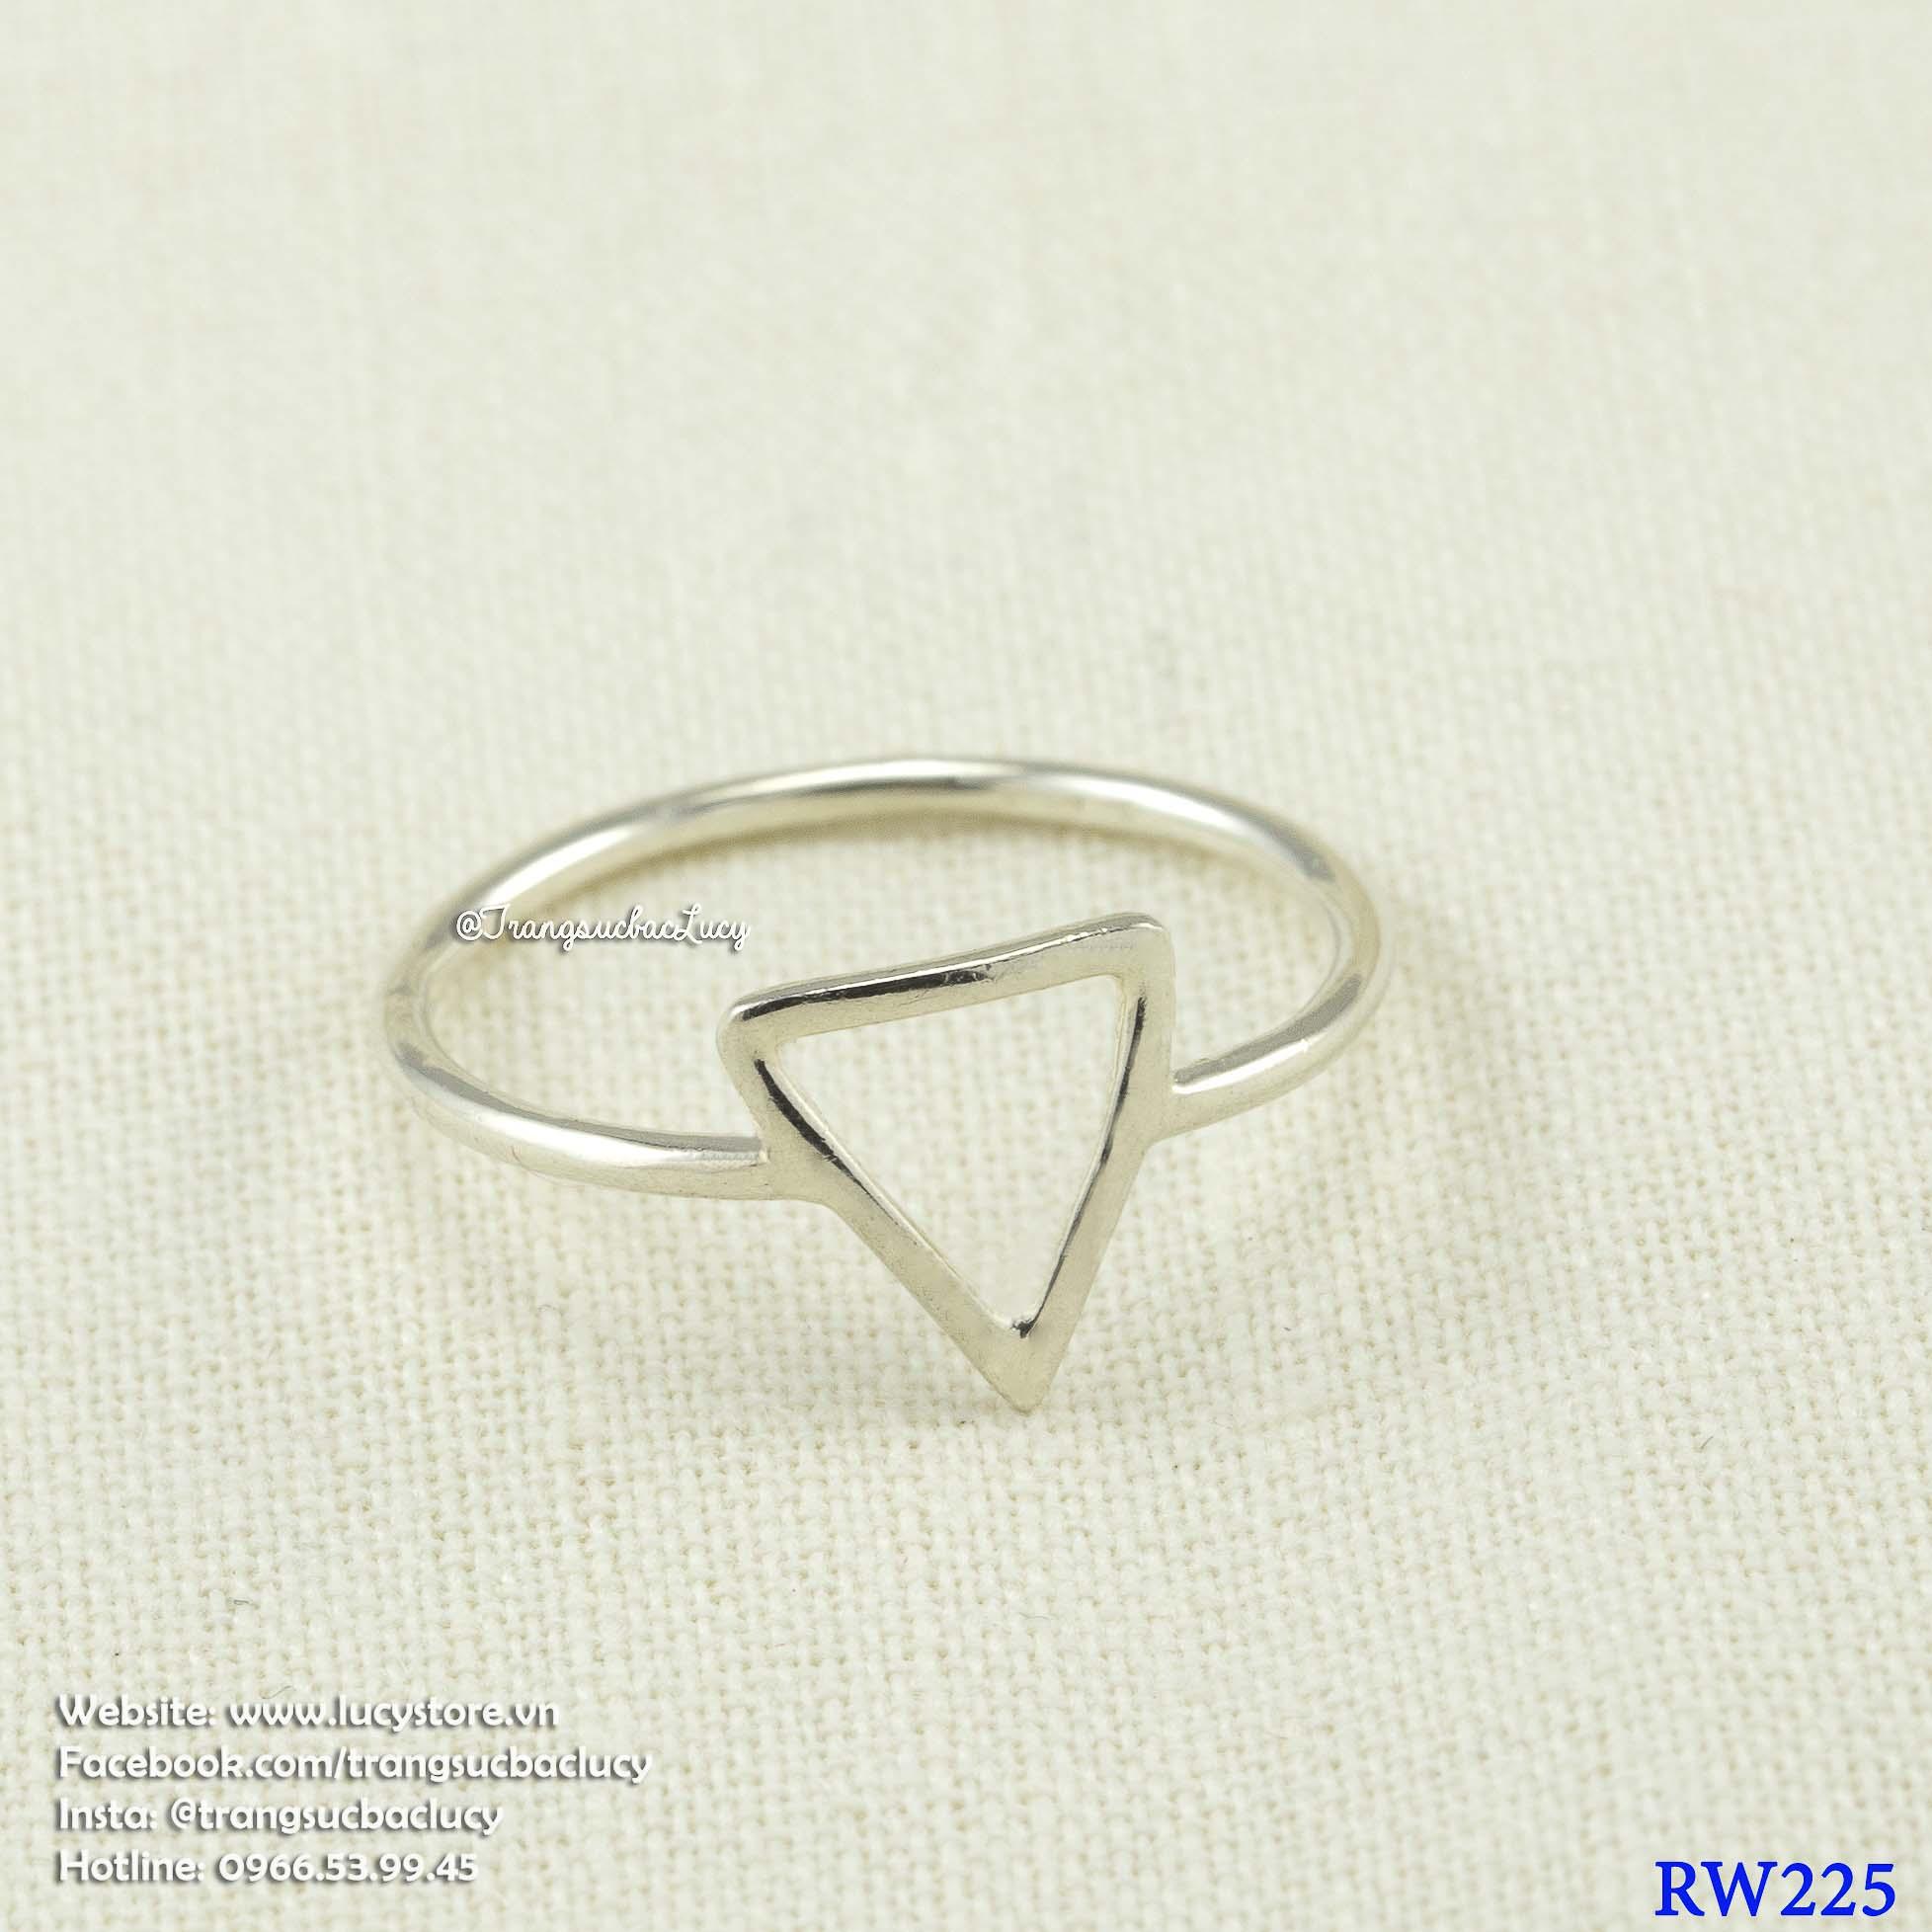 Nhẫn tam giác - RW225